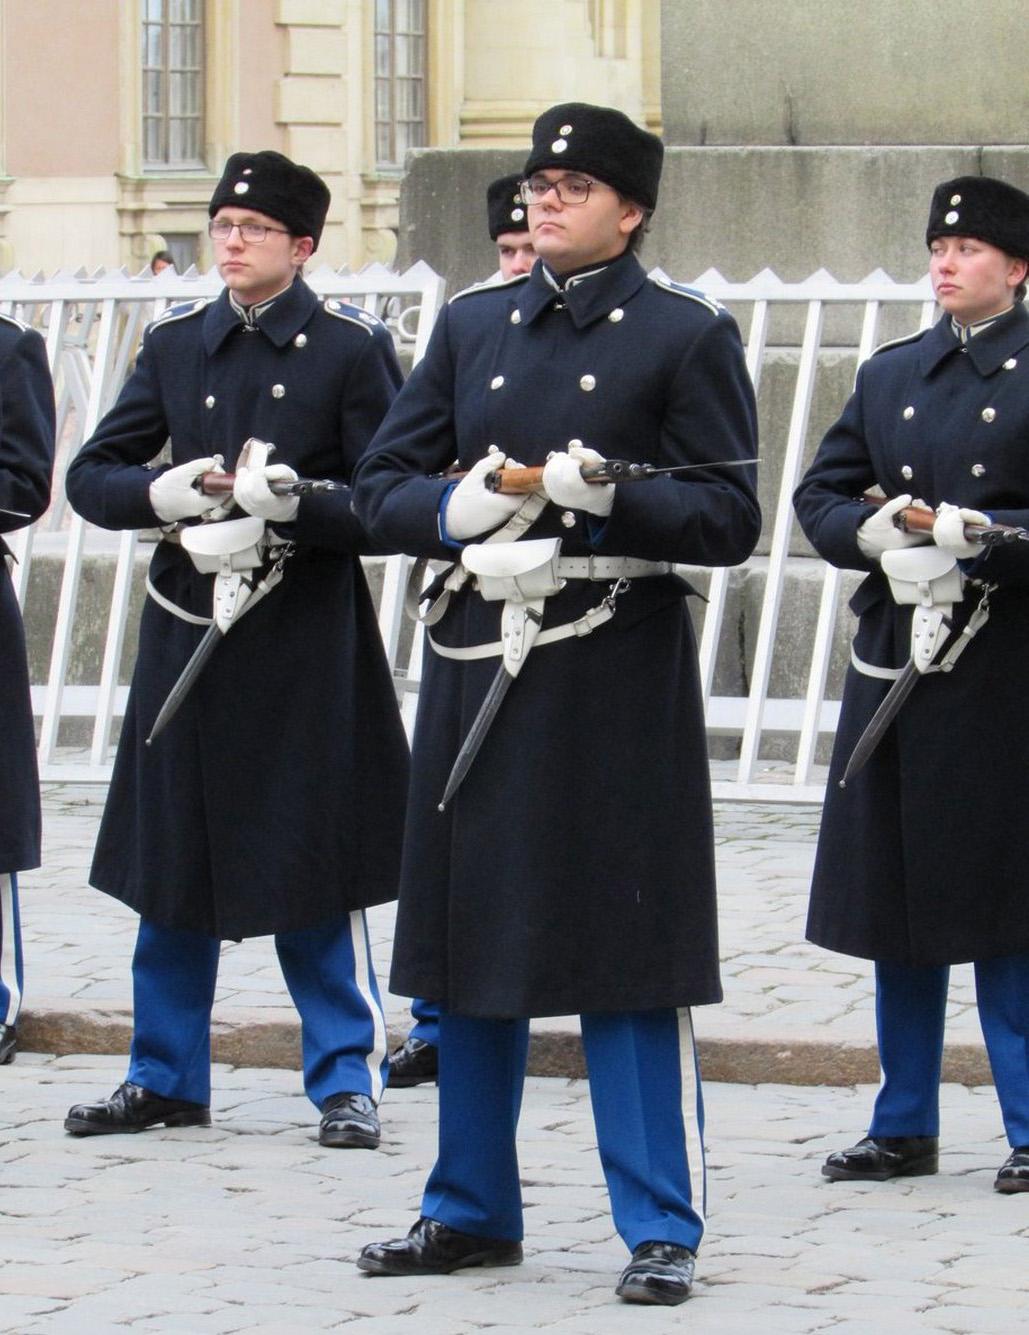 Бравые шведские солдаты